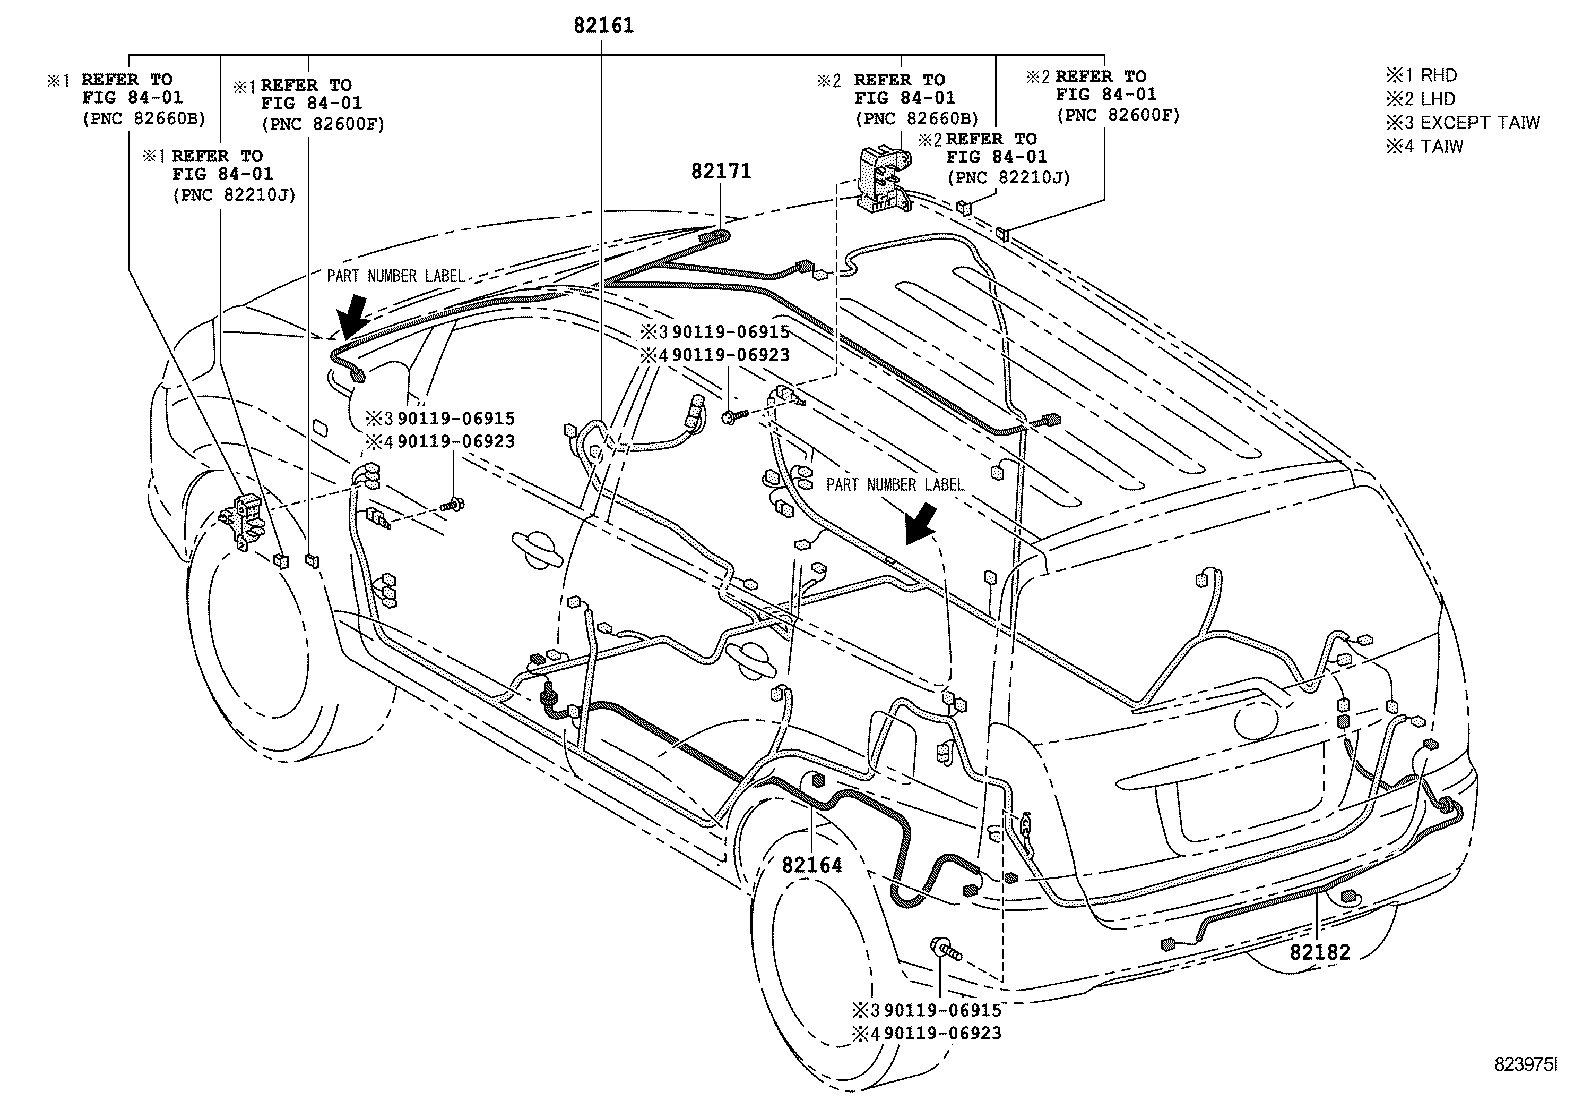 Wiring Diagram Innova: Toyota innova wiring diagram